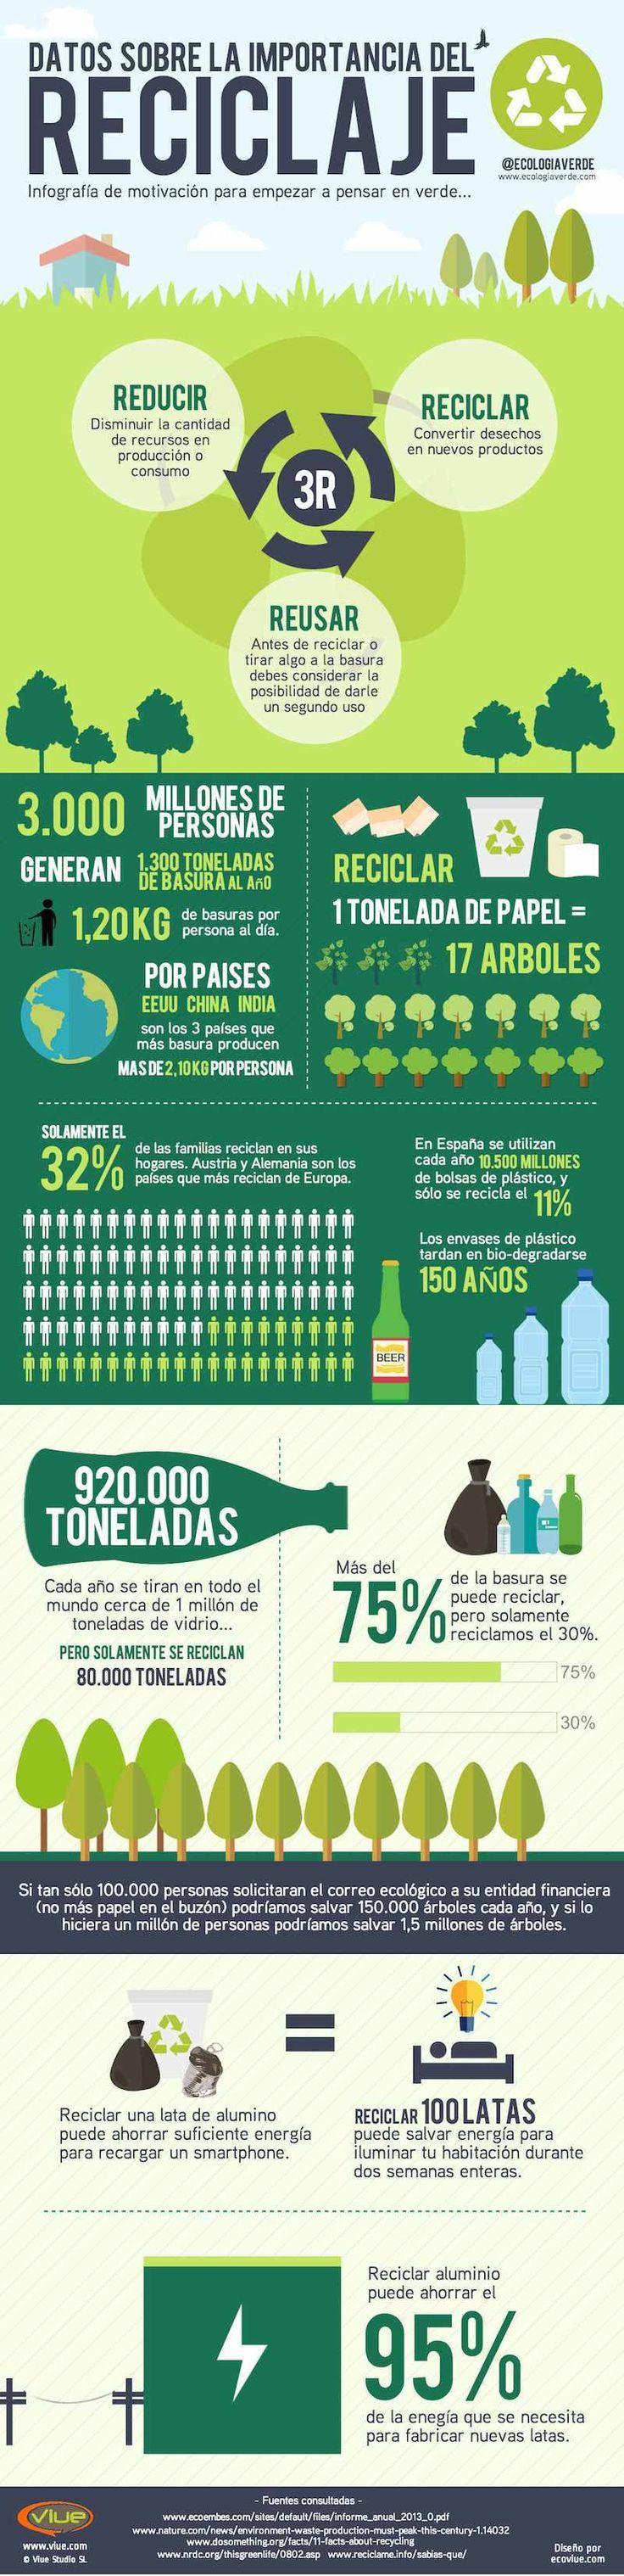 la importancia del reciclaje #infografias #infographic